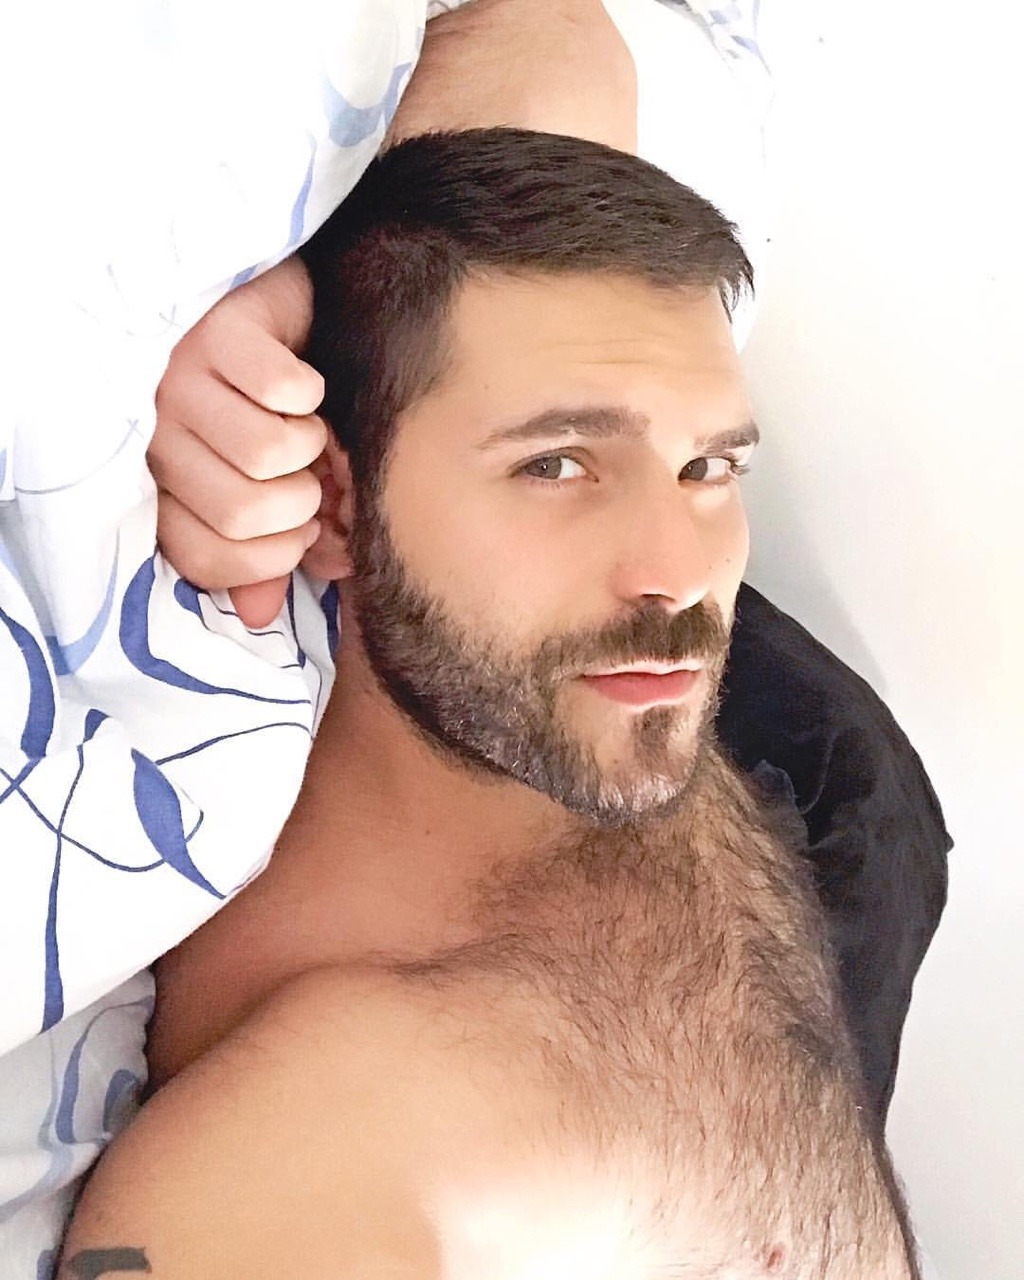 2018-11-18 09:12:39 - officialsergiomenor instagram beardburnme http://www.neofic.com